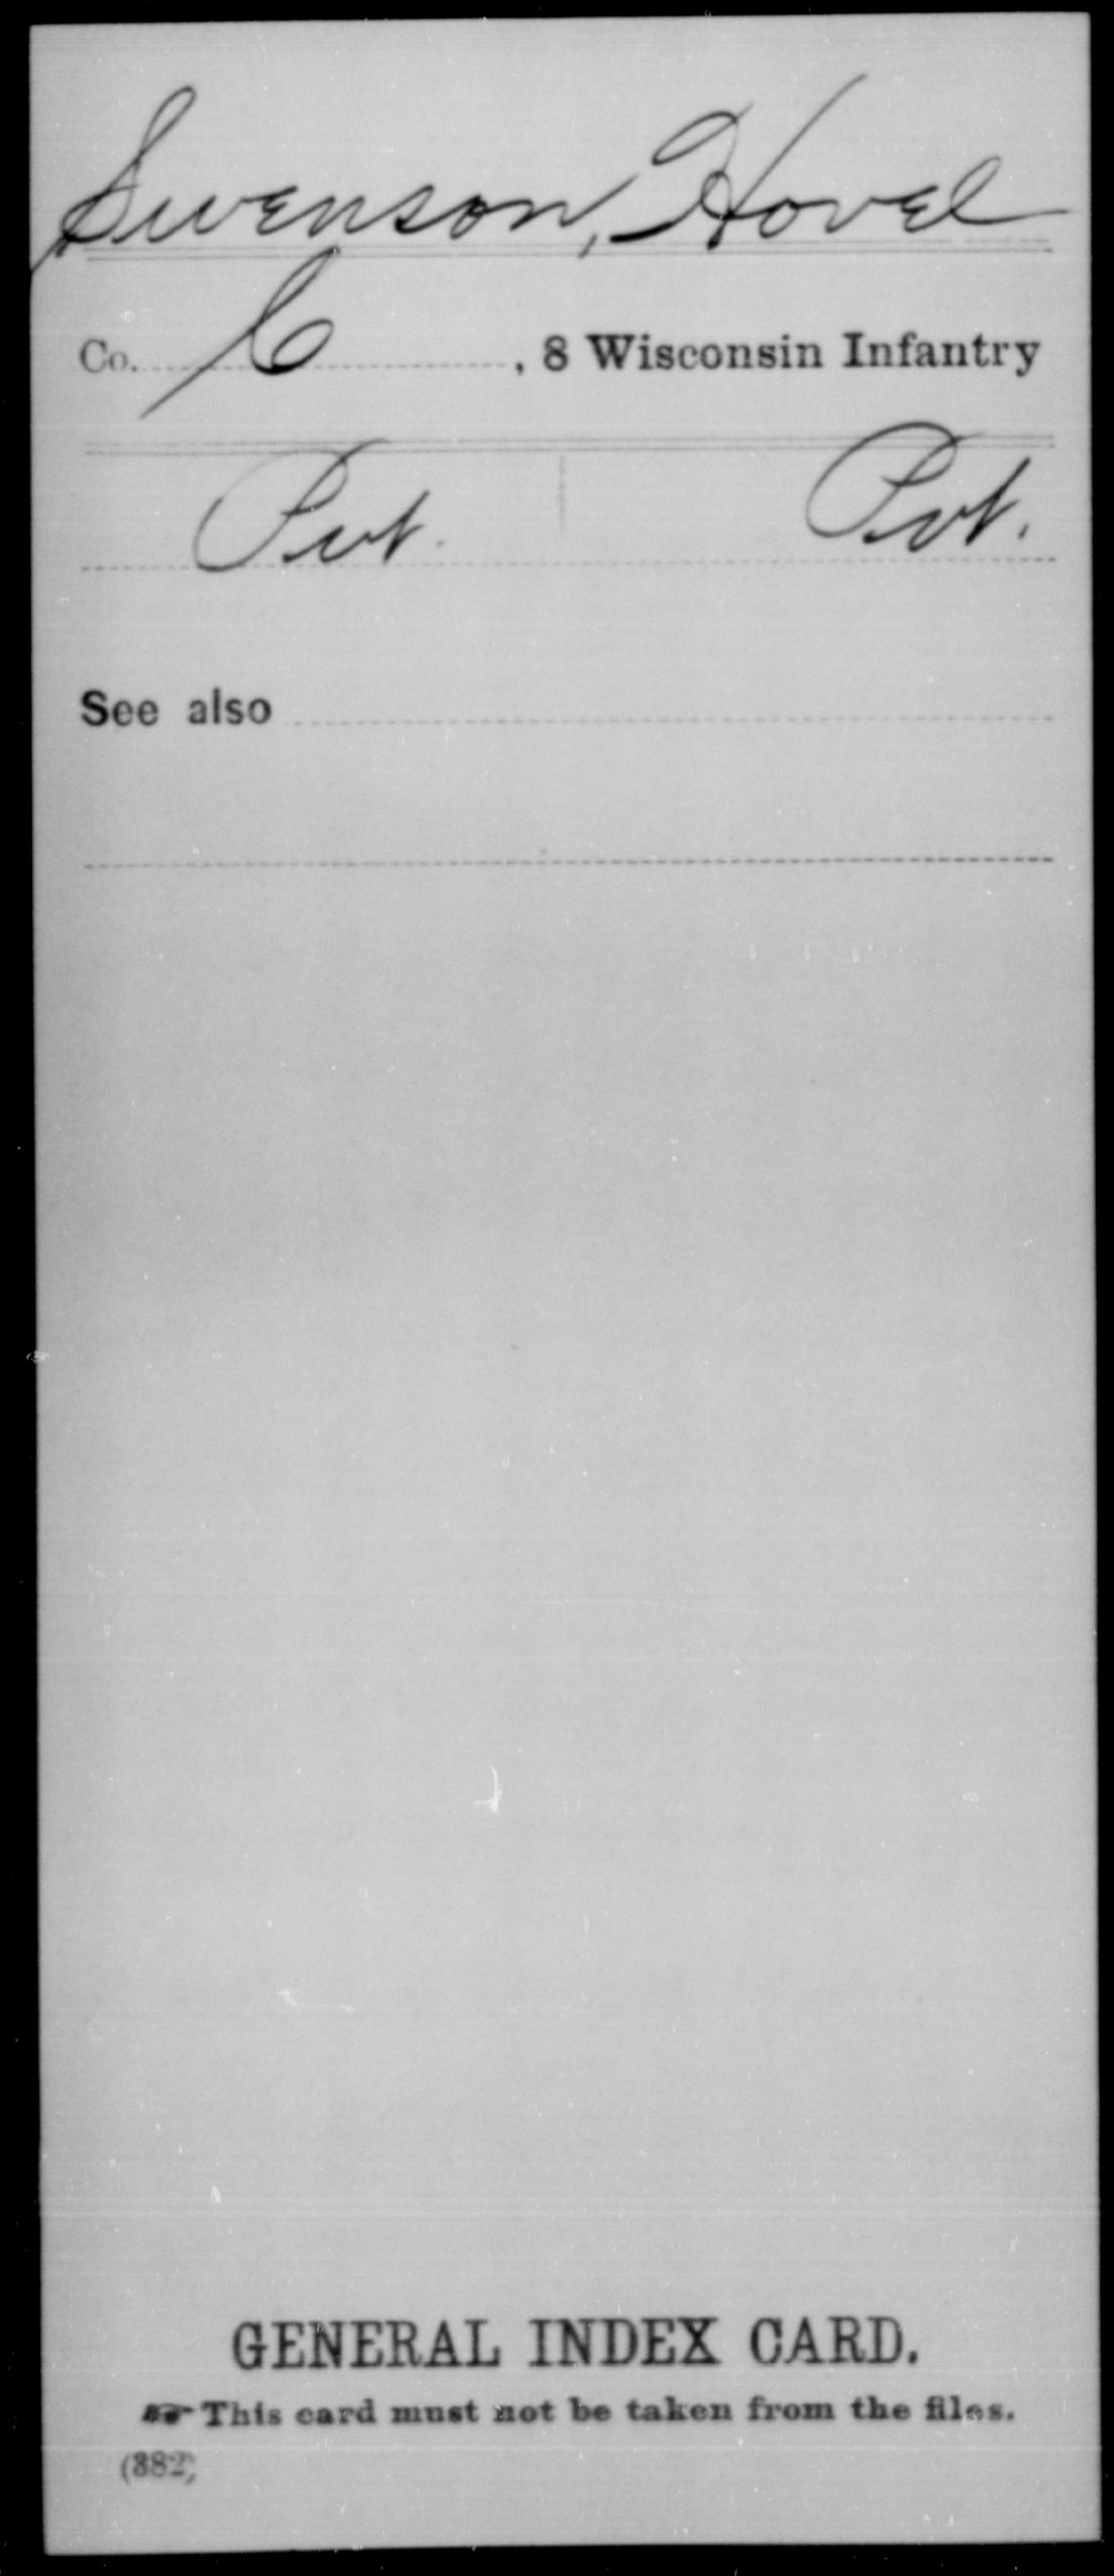 [Wisconsin] Swenson, Hovel - 8th Infantry, Company C